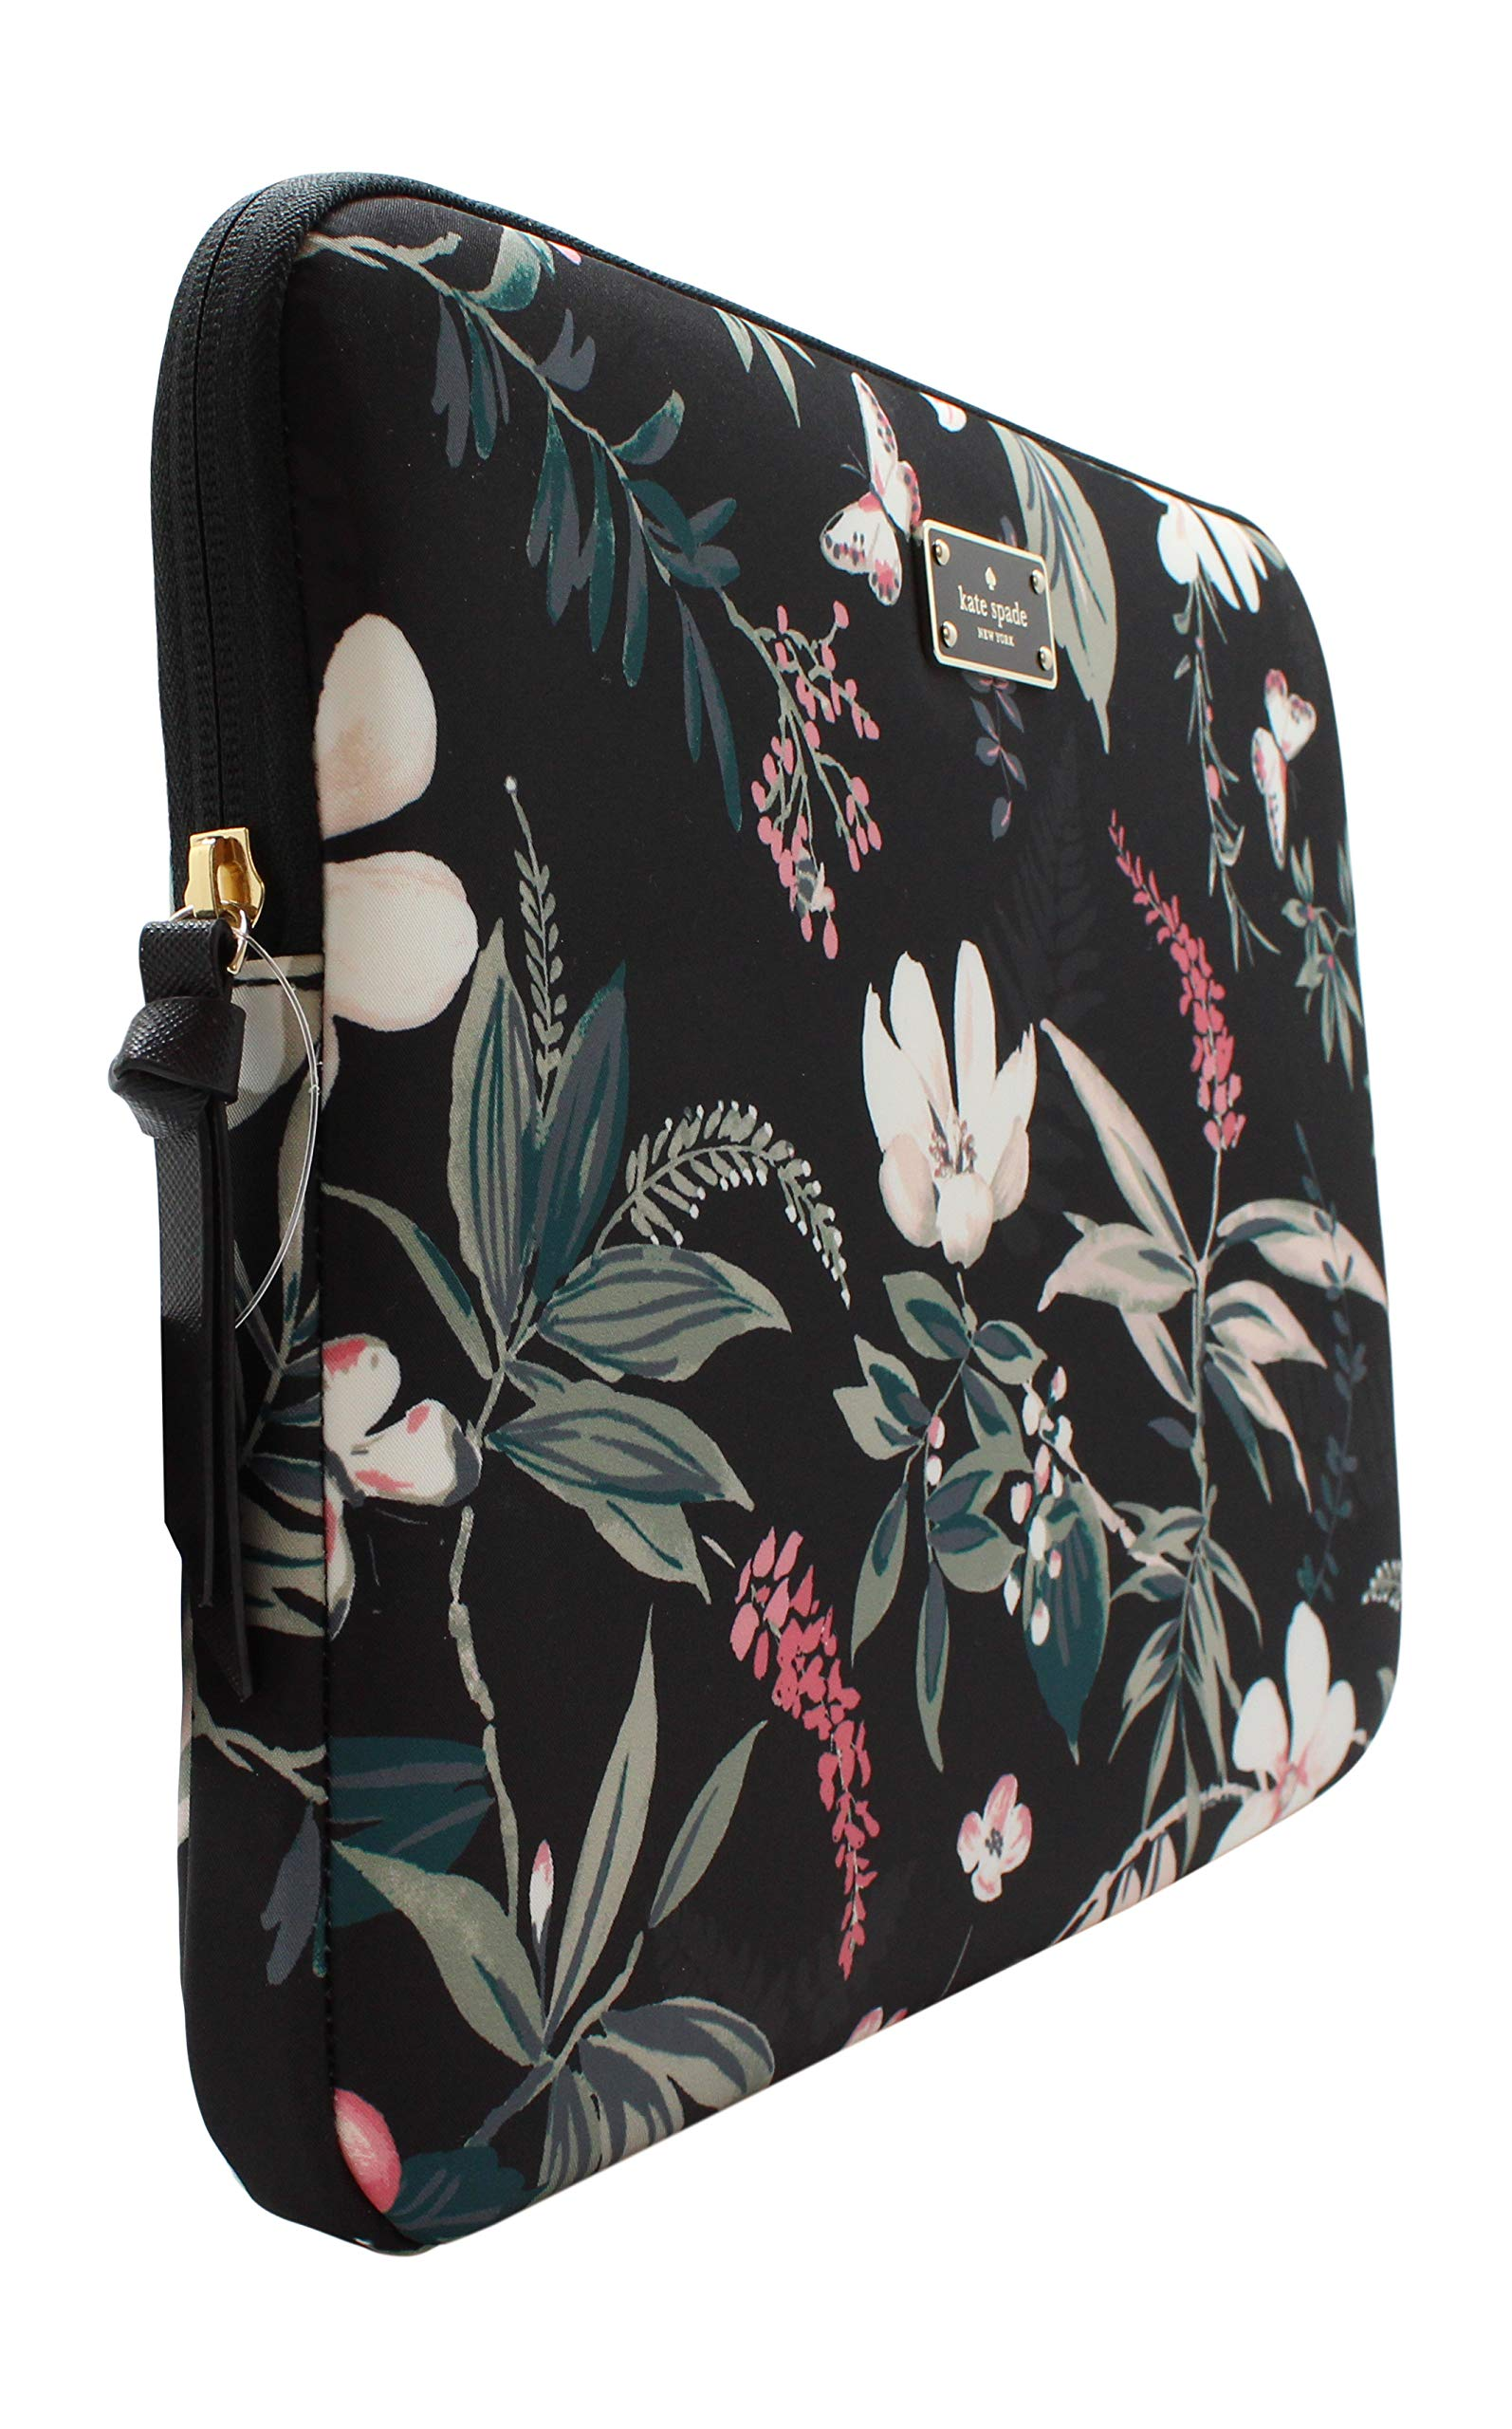 Kate Spade Wilson Rd Botanical Laptop Case Sleeve Black Multi 13'' by Kate Spade New York (Image #6)